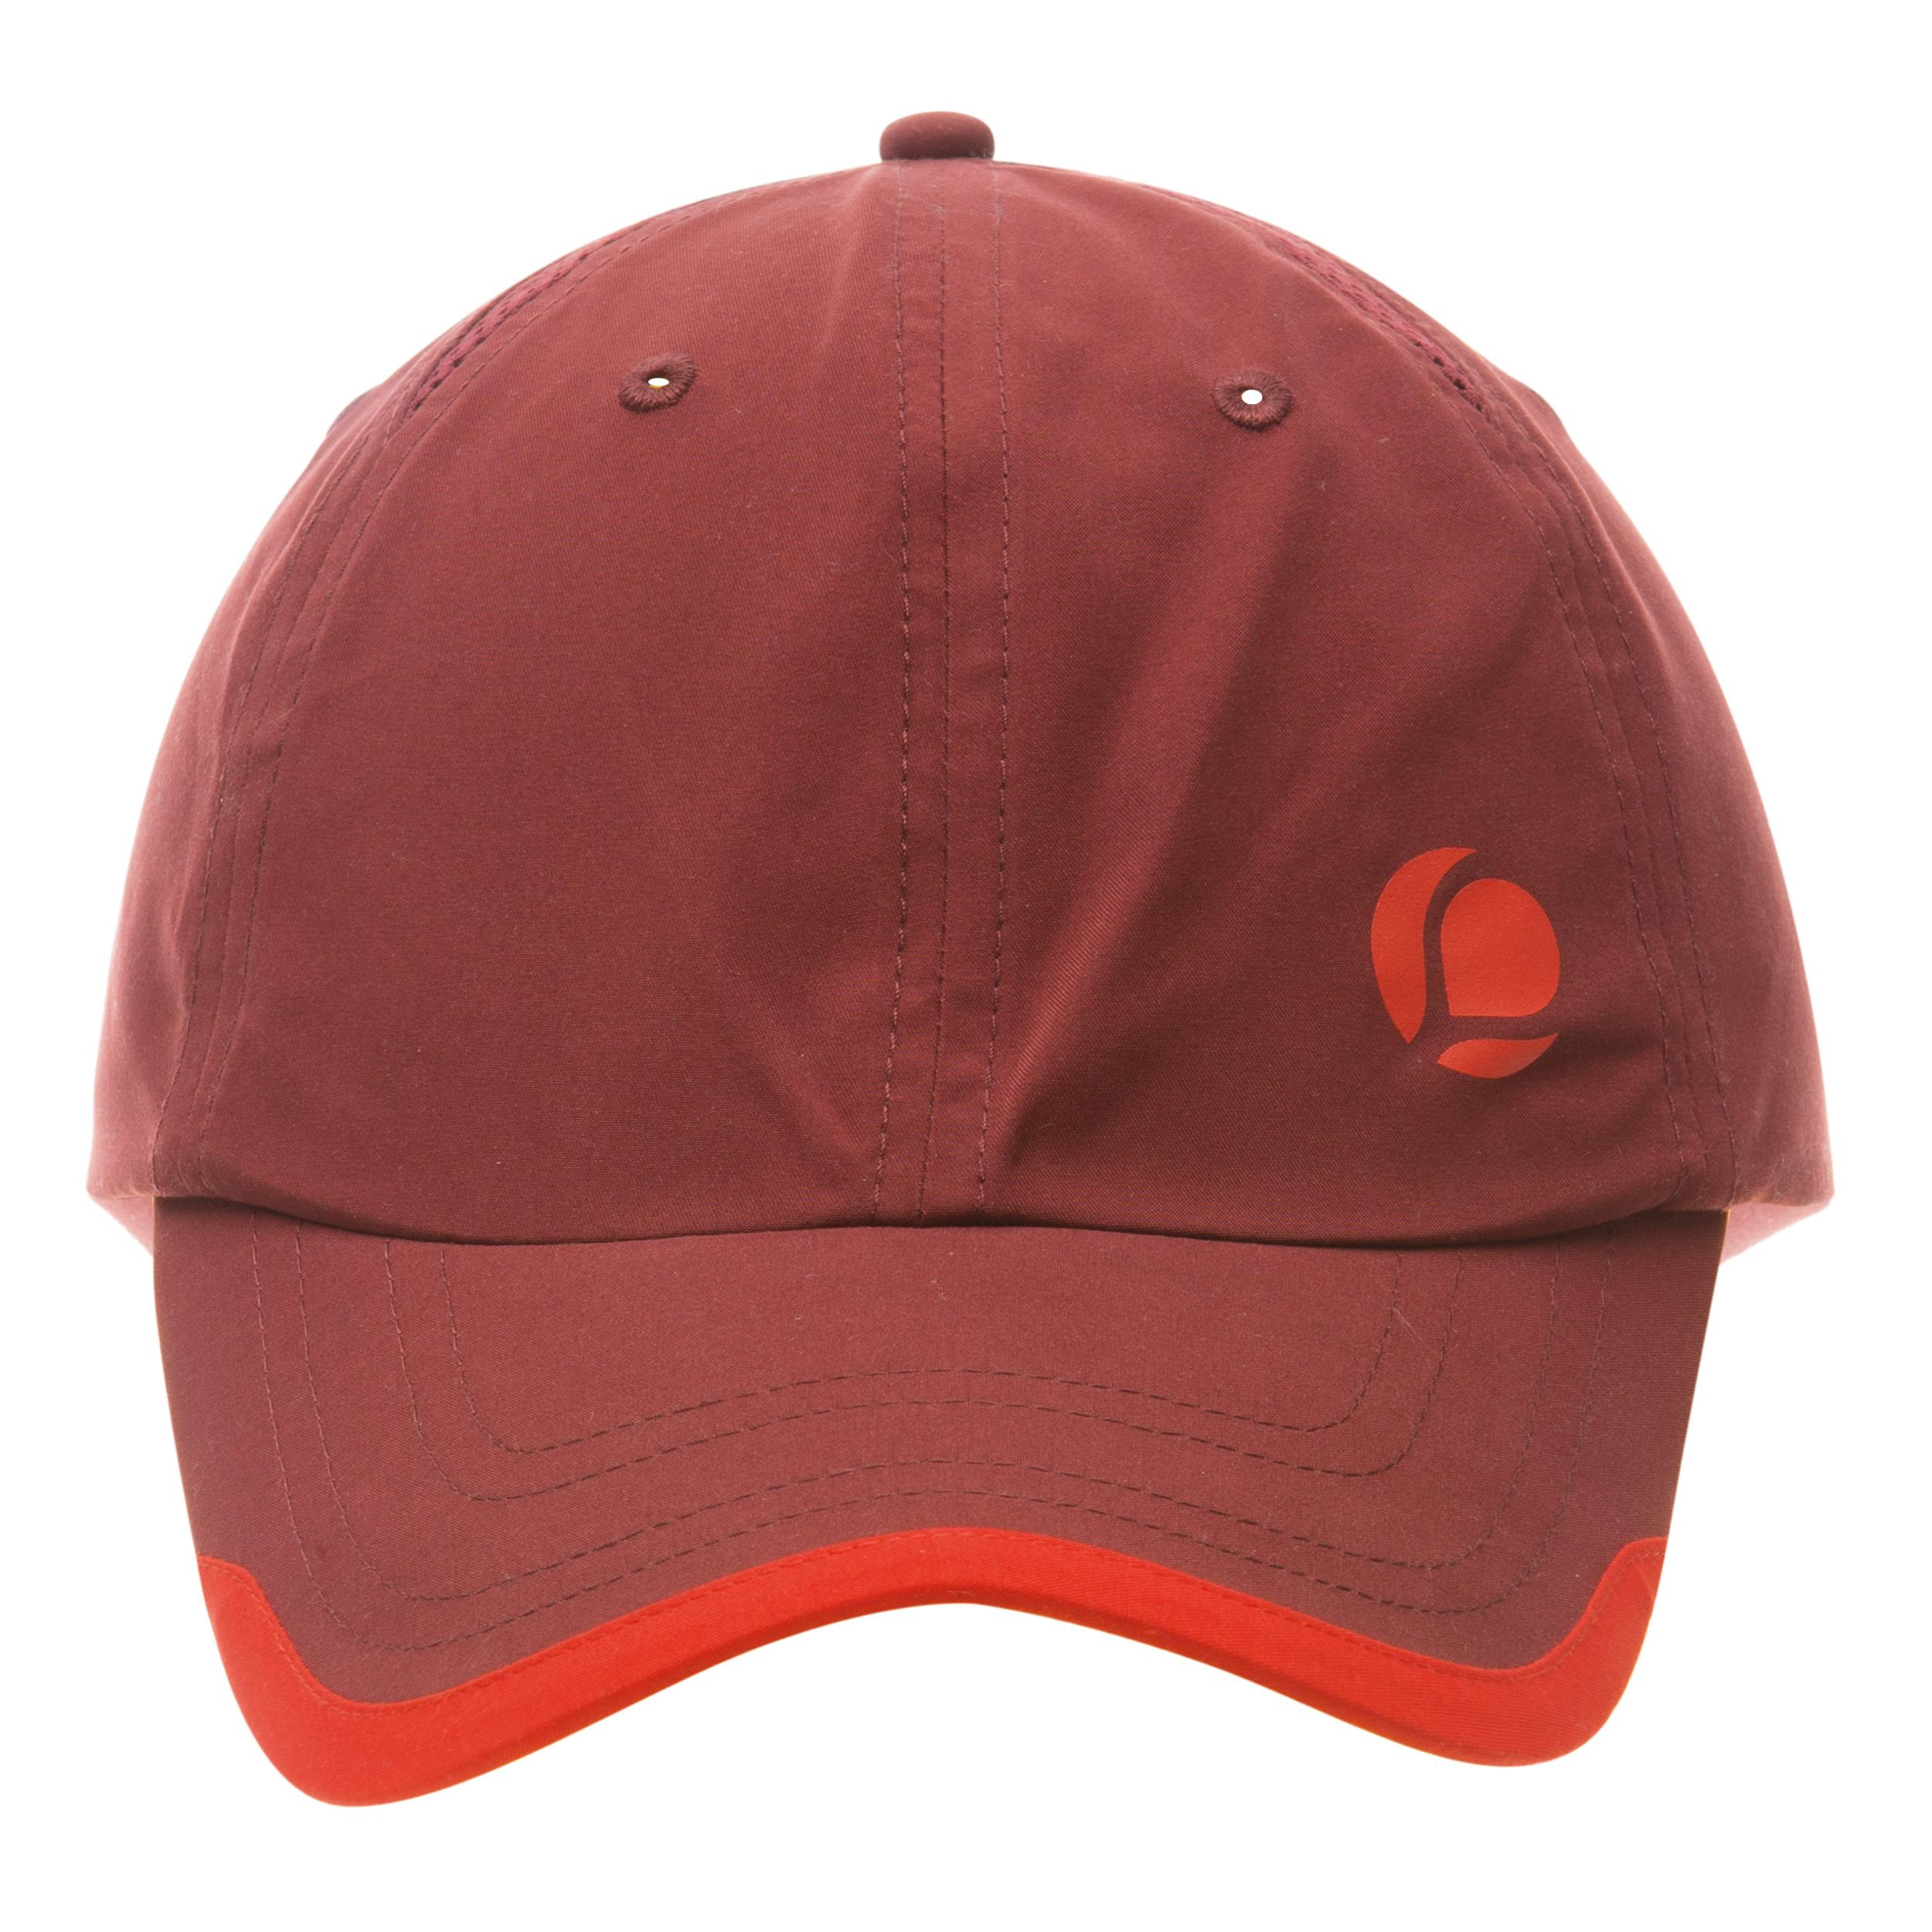 Adult Cap - Burgundy